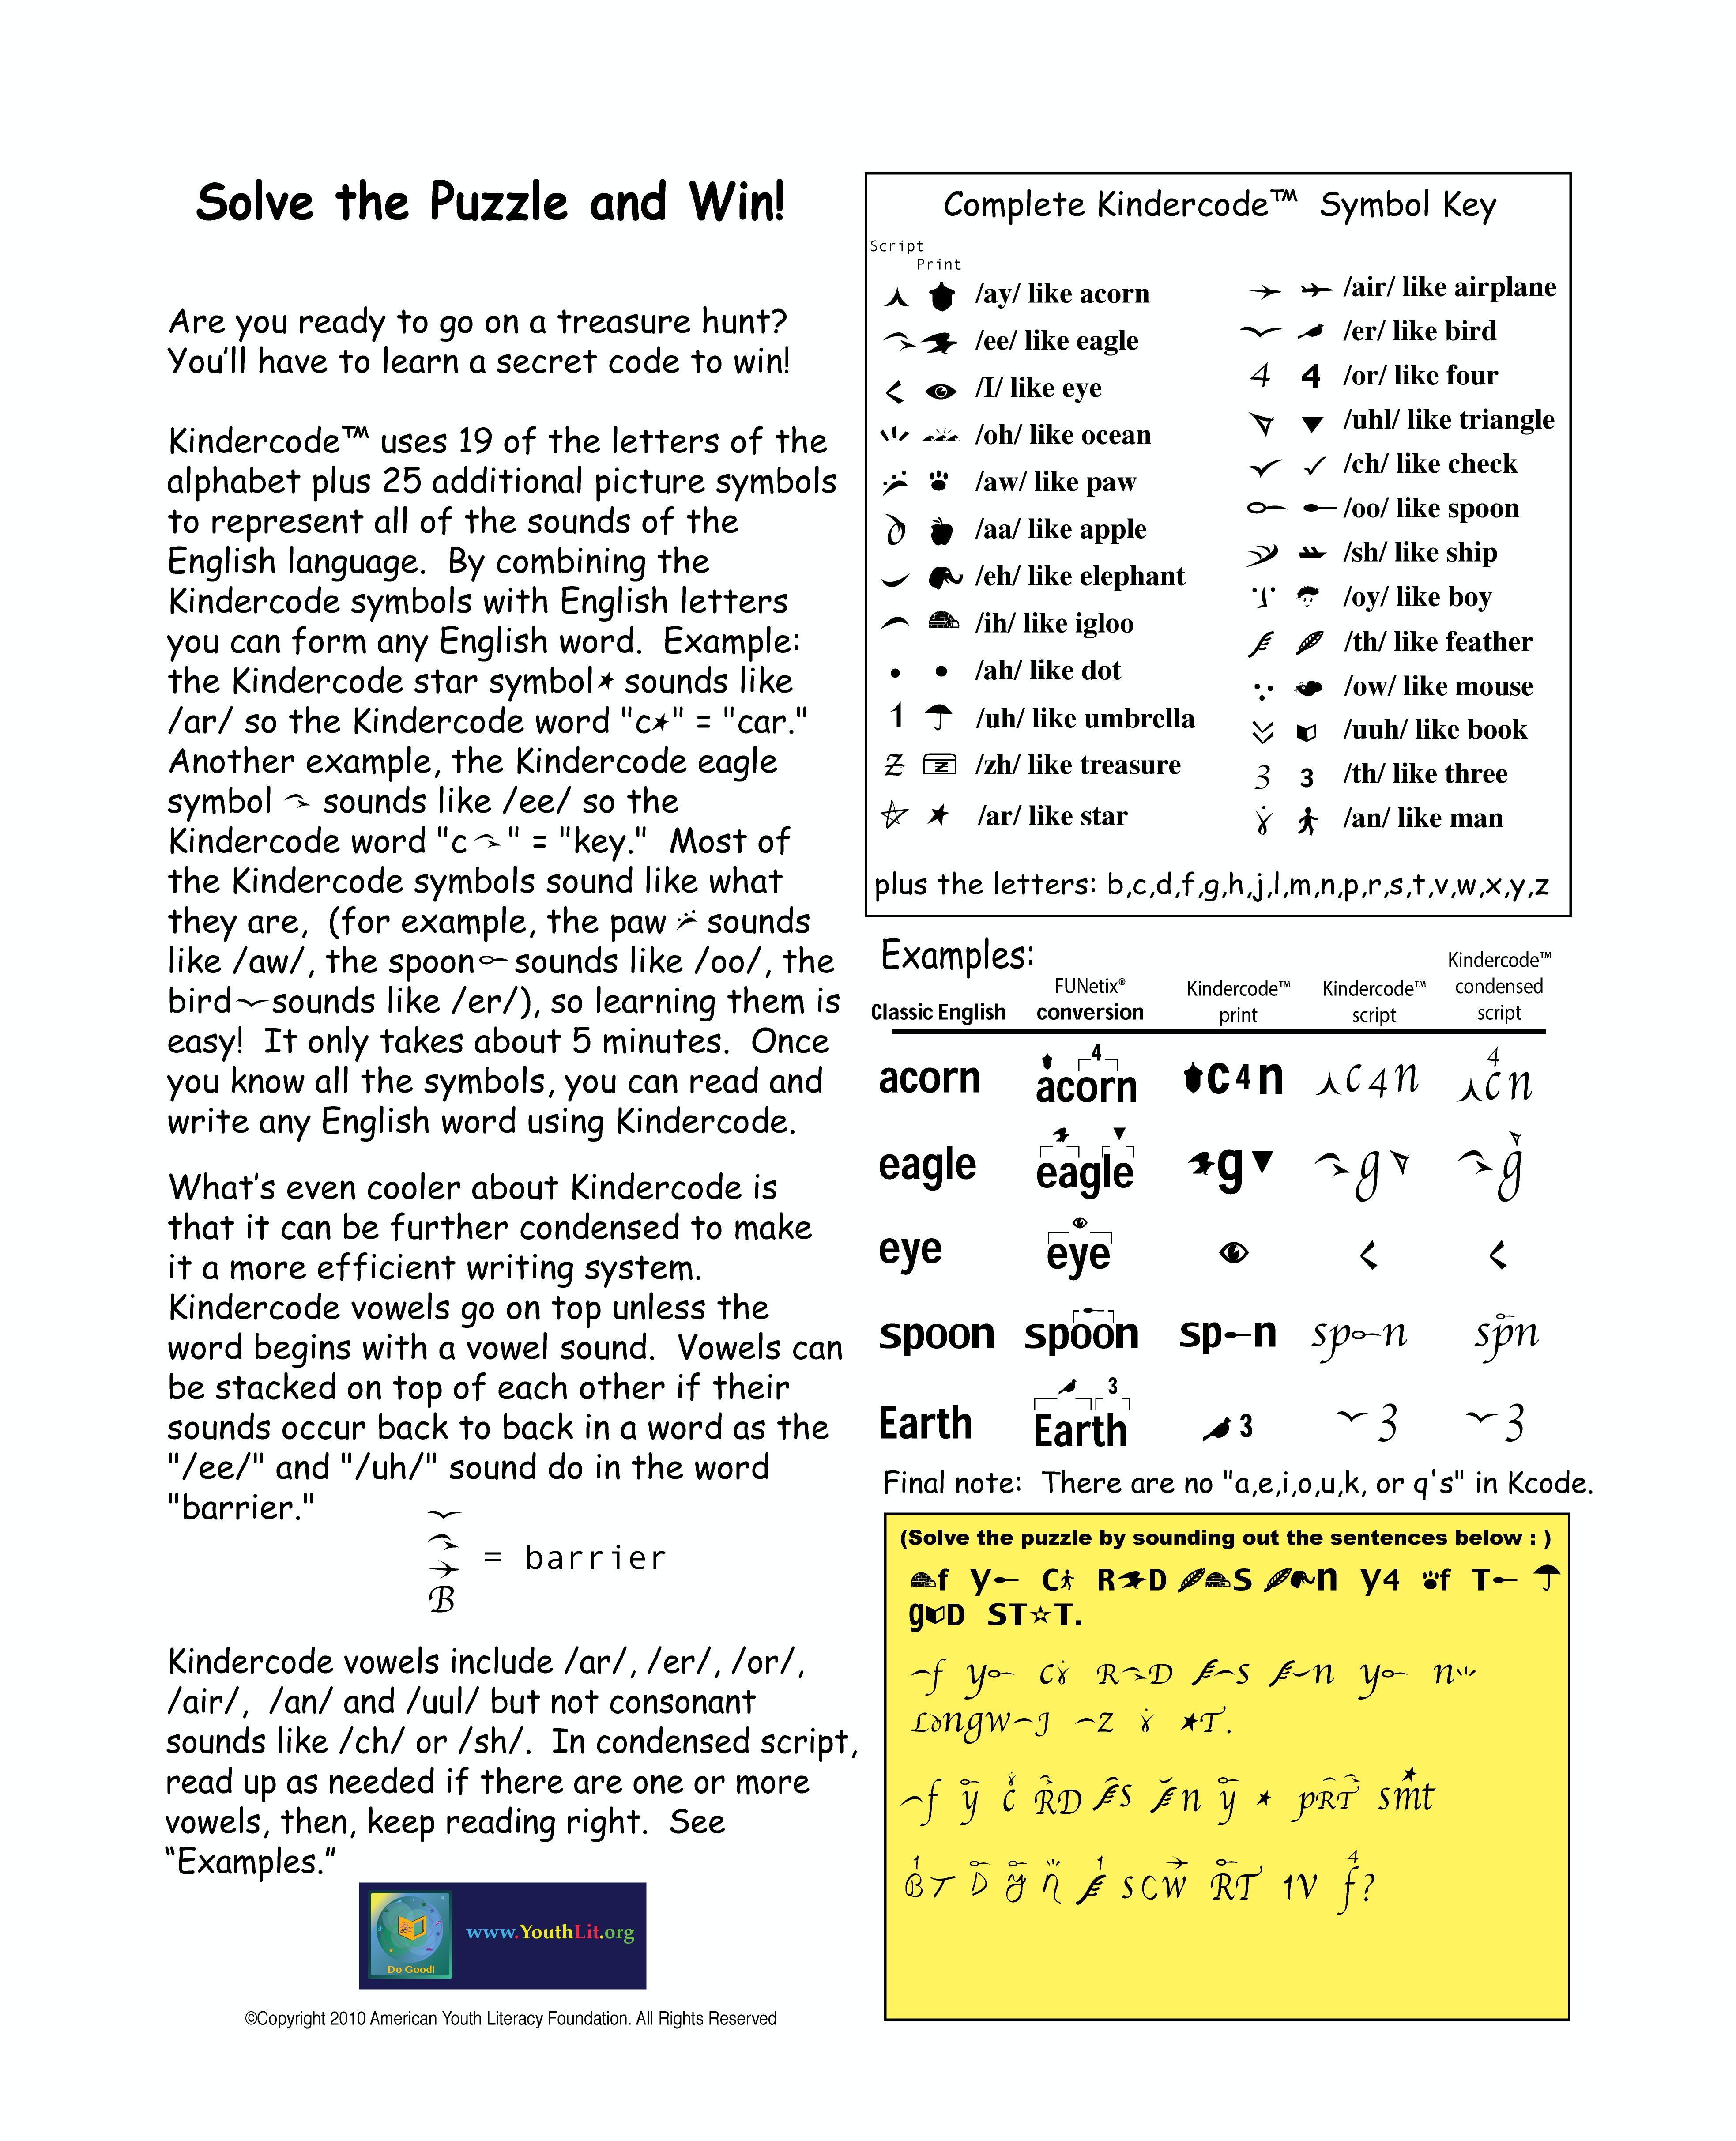 kindercode puzzle